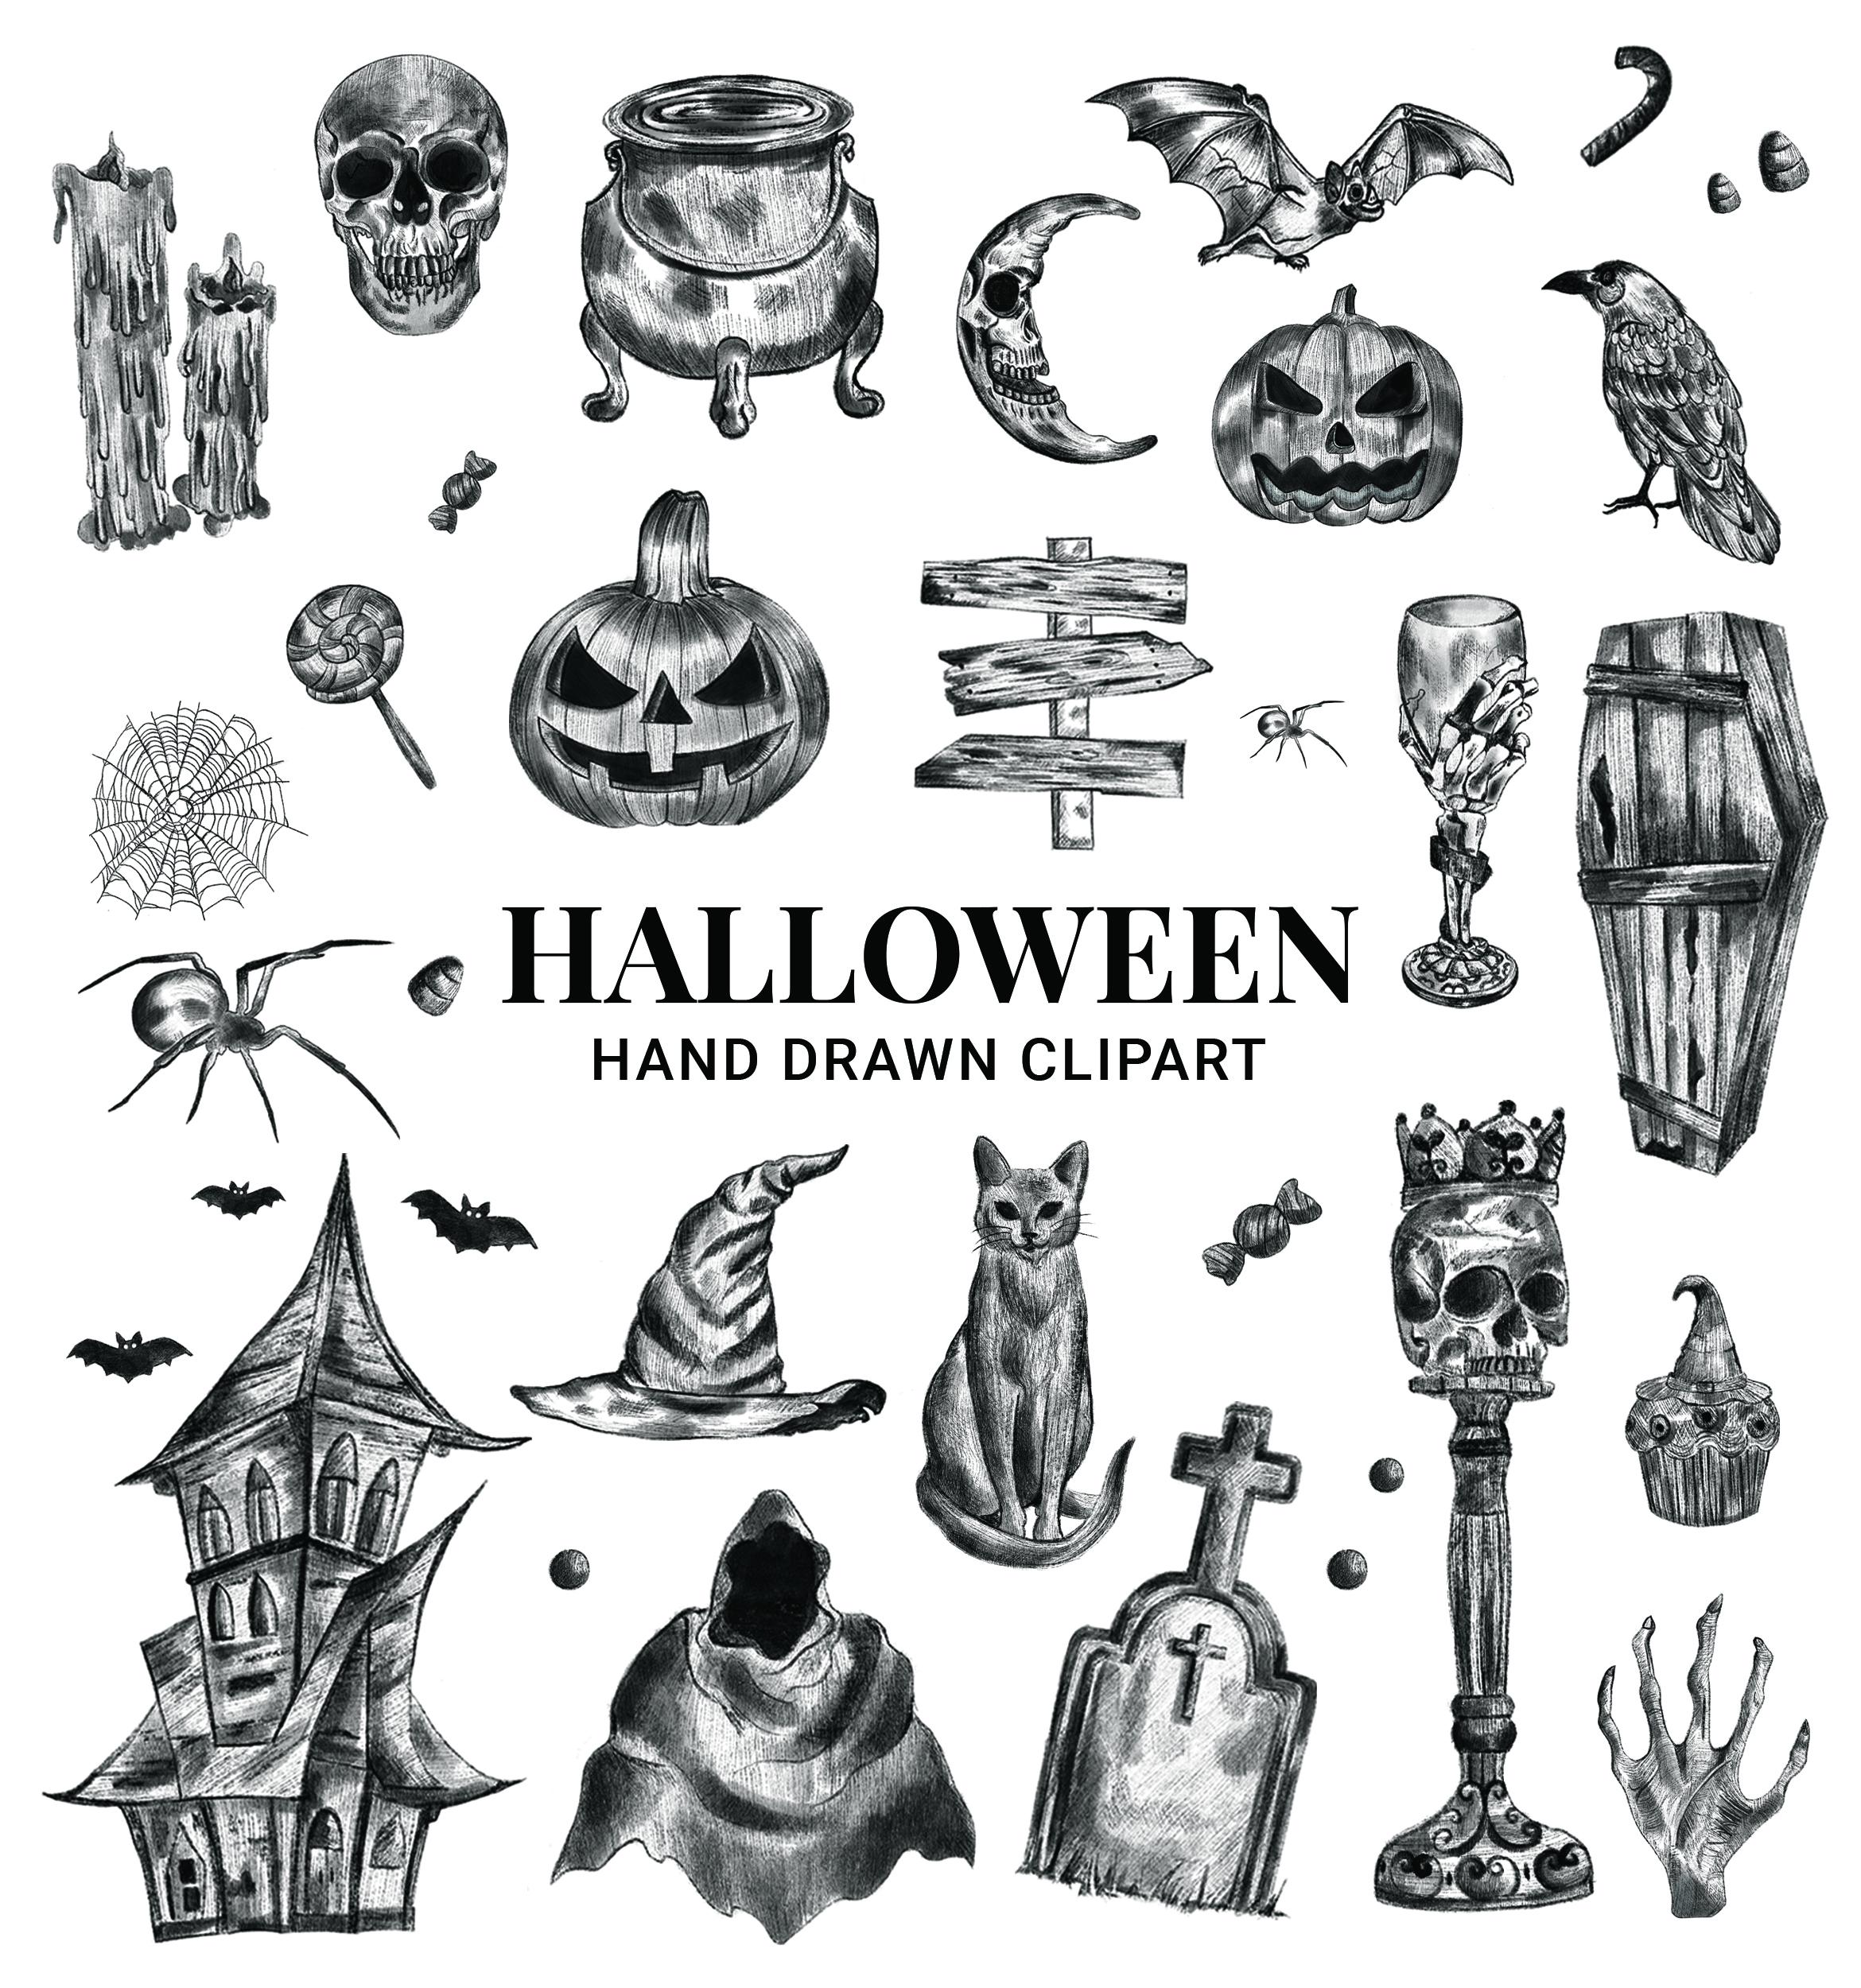 Halloween Hand Drawn Sketch Clipart Vector